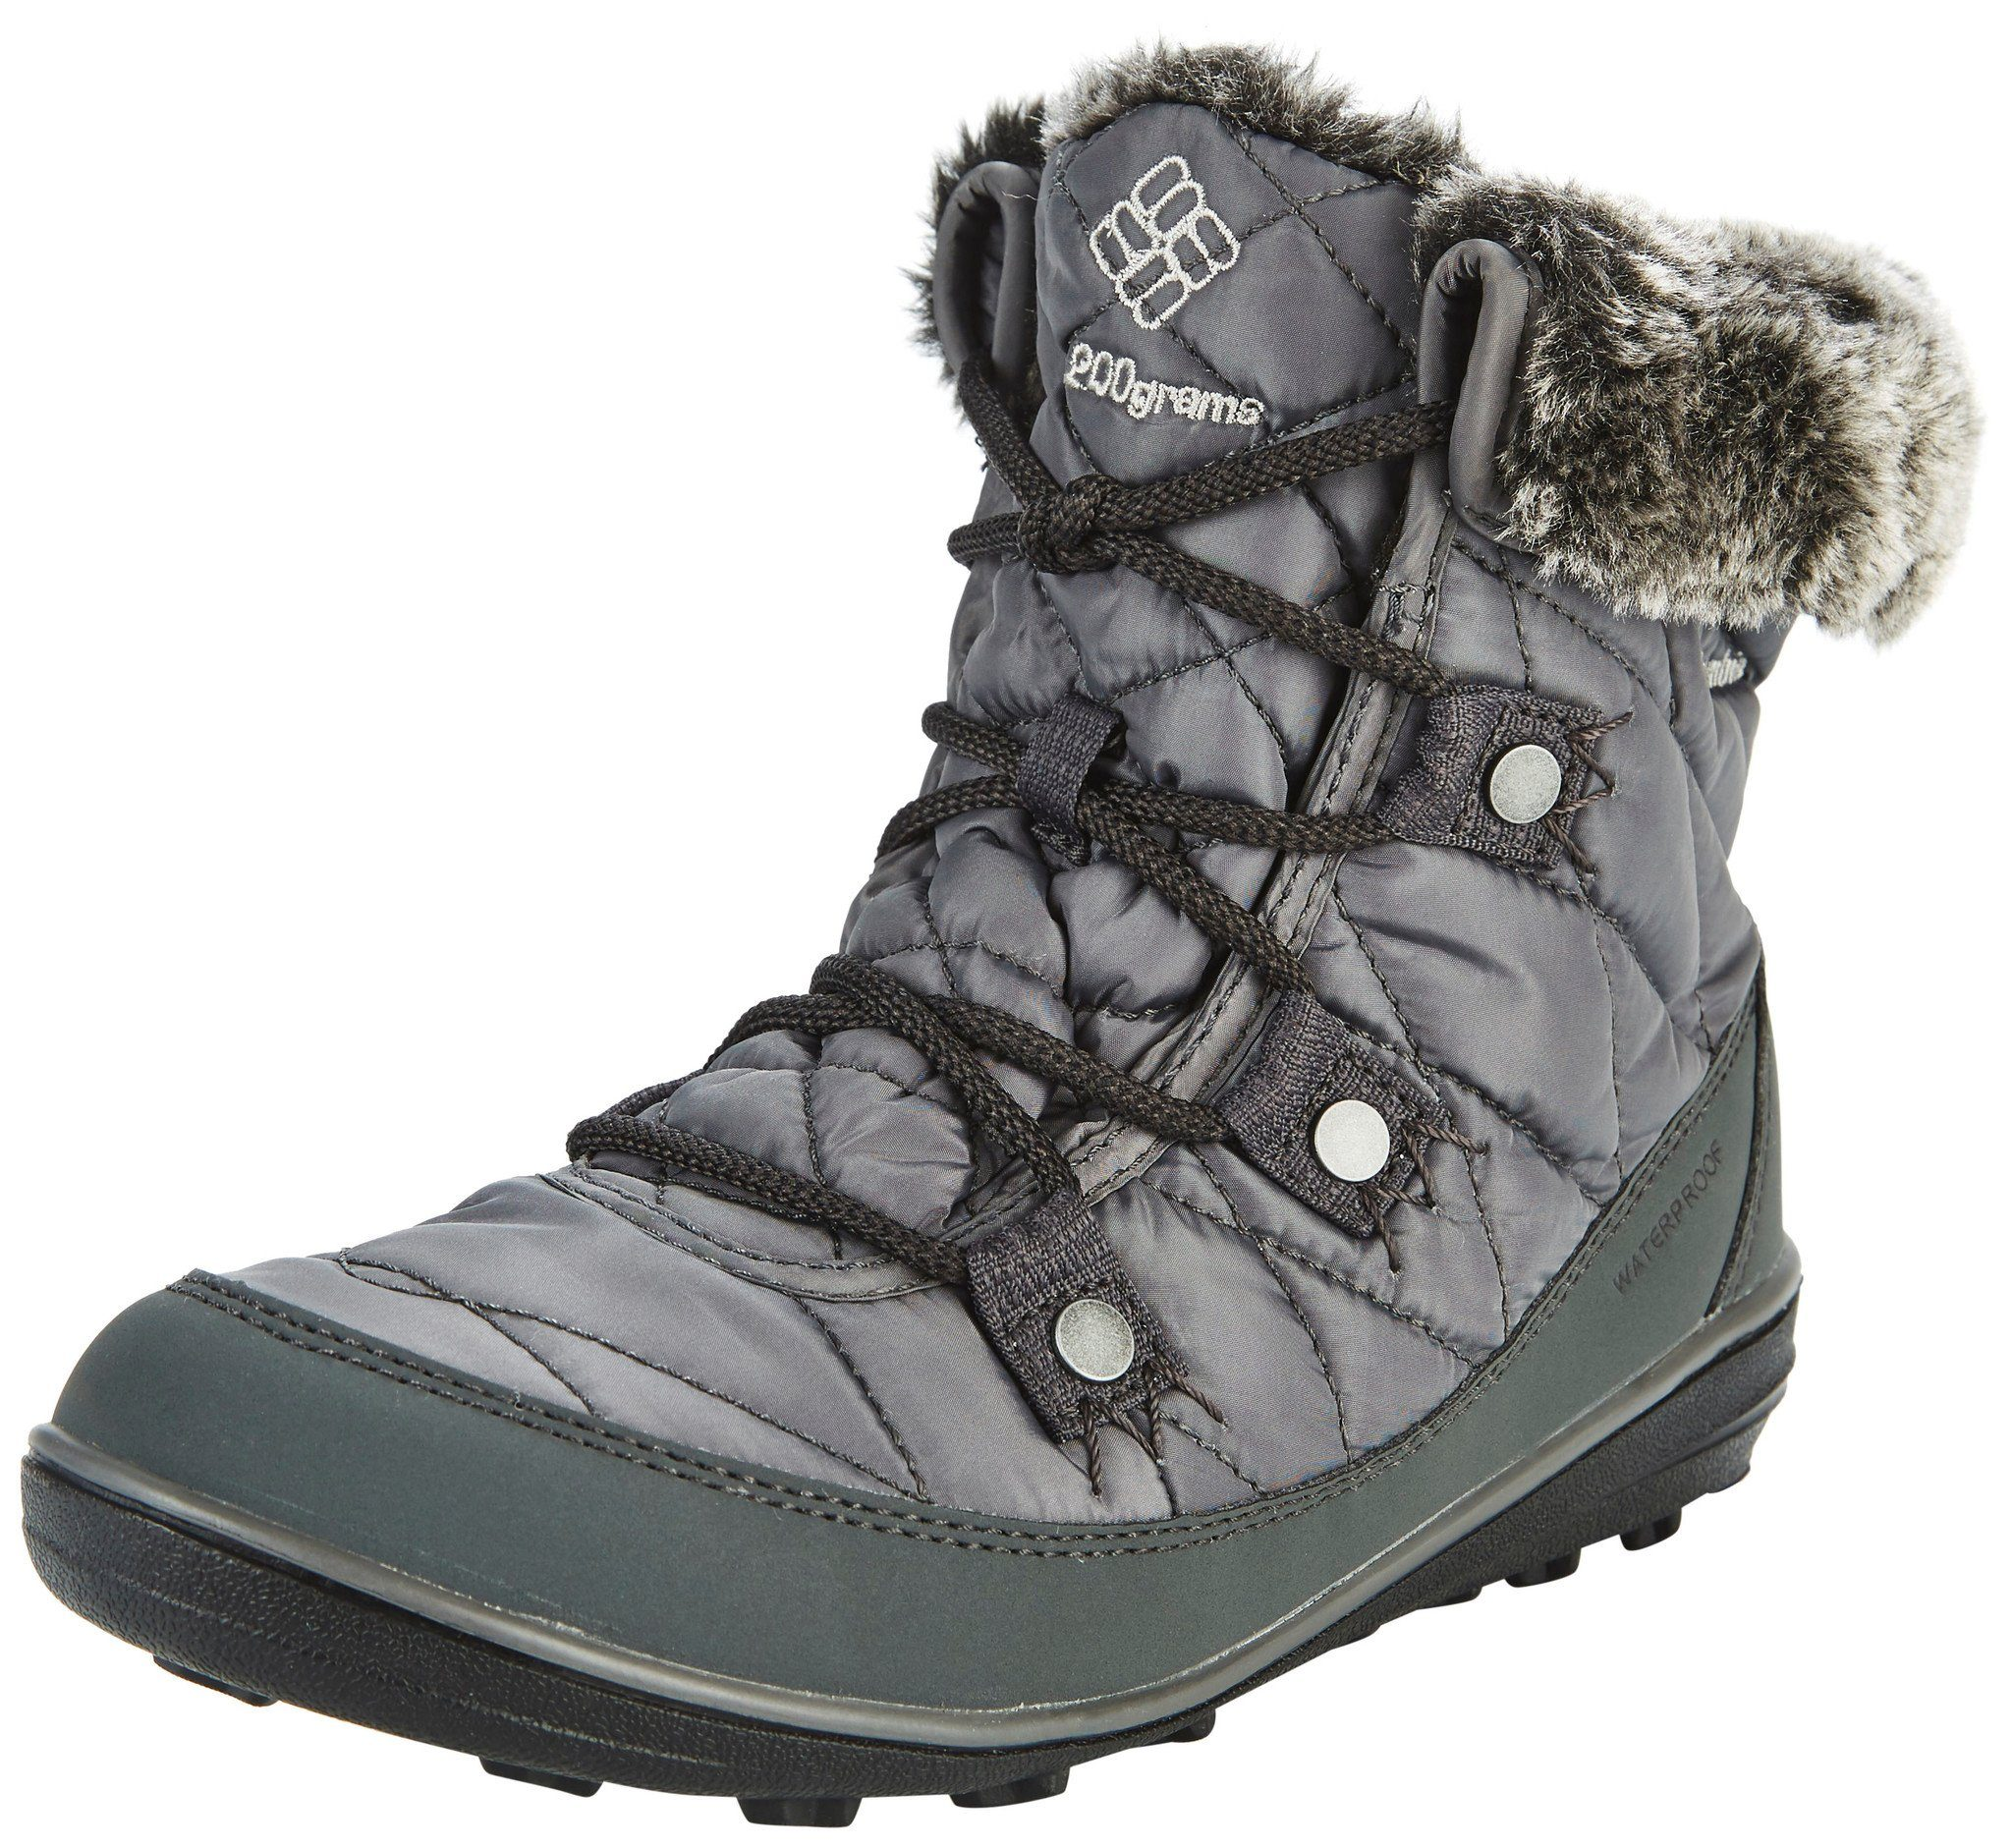 Columbia Kletterschuh »Heavenly Shorty Shoes Women Omni-HEAT«